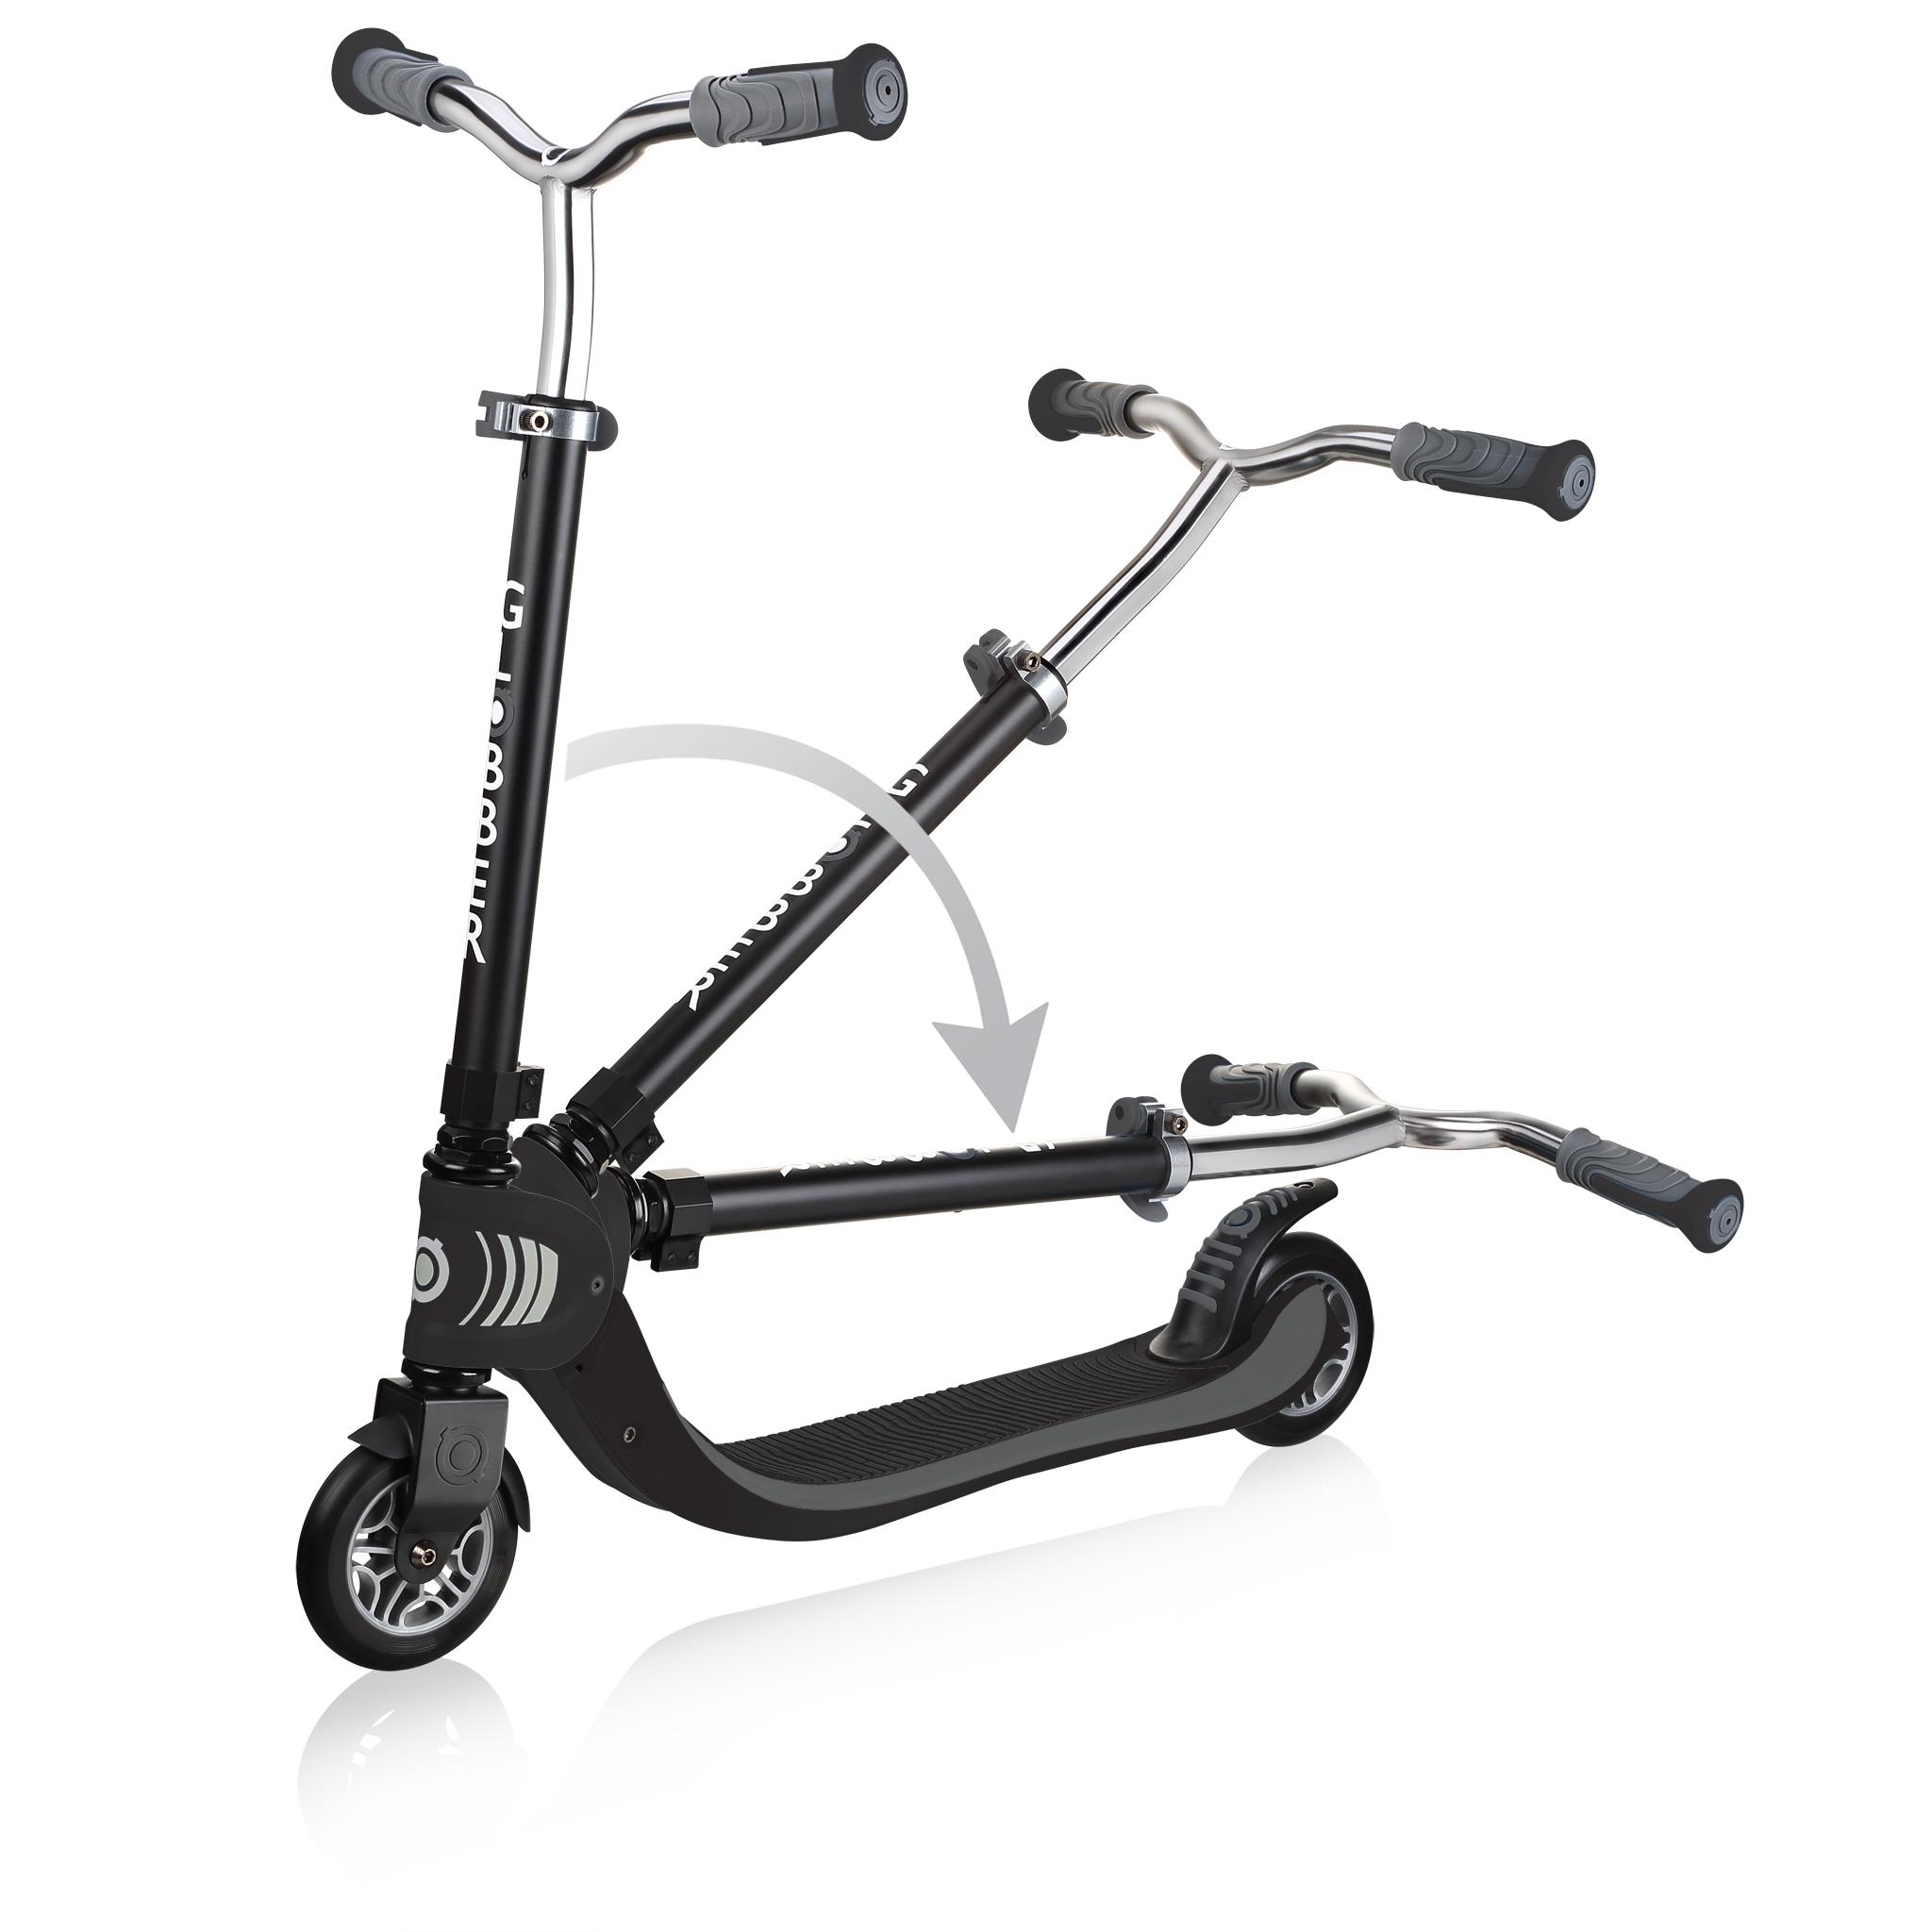 FLOW-FOLDABLE-125-2-wheel-folding-scooter-for-kids-black